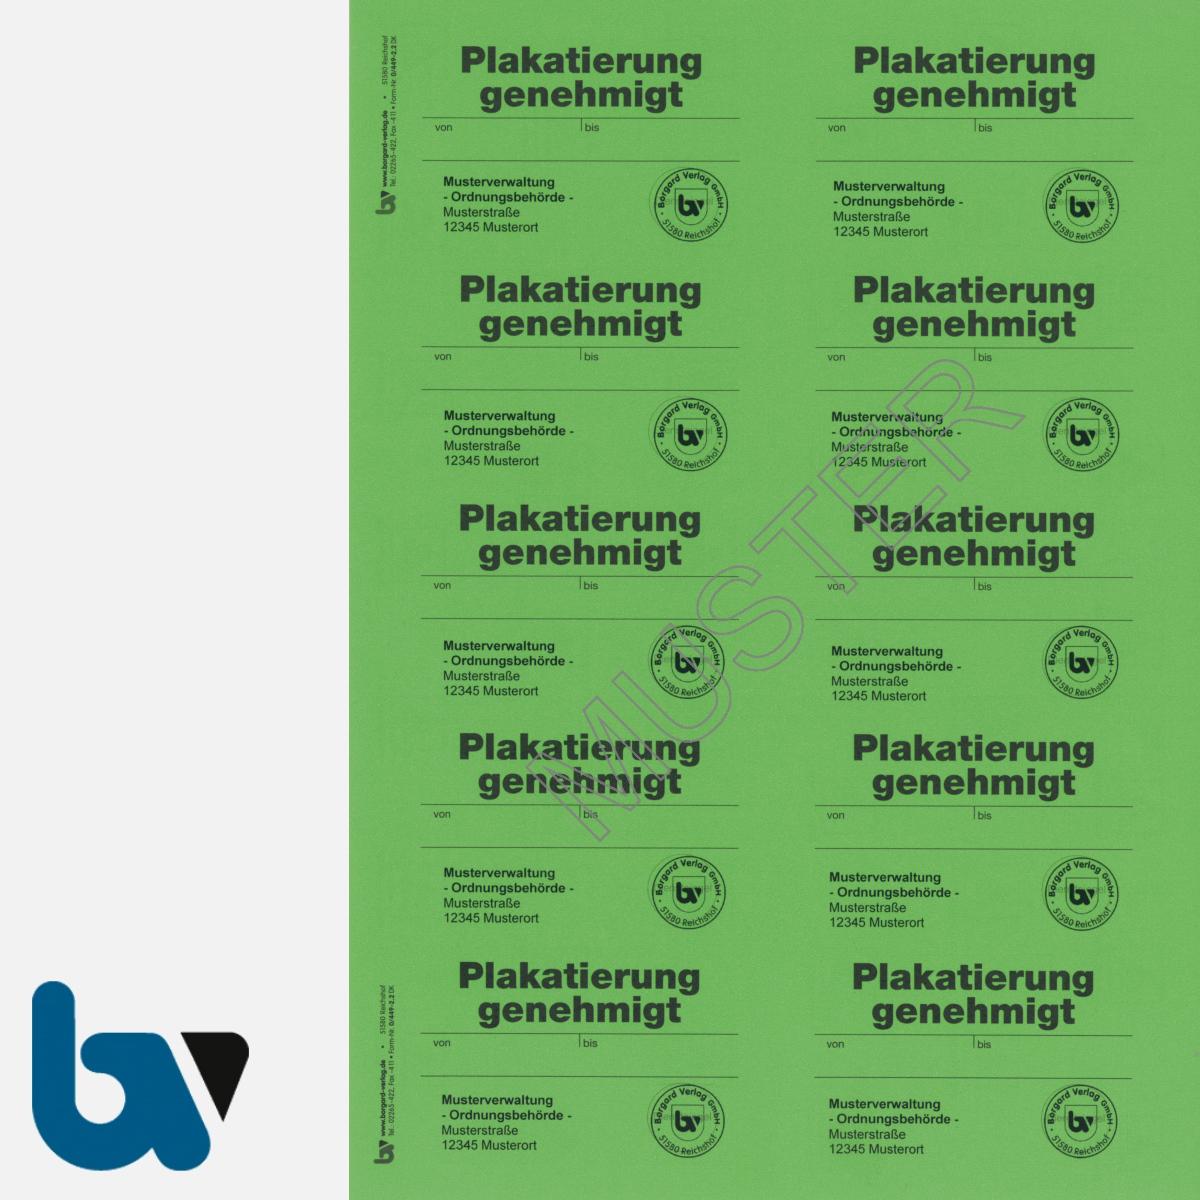 0/449-2.2 Aufkleber Plakatierung Genehmigt Muster leucht grün 75 x 50 mm selbstklebend Bogen 10 Stück DIN A4   Borgard Verlag GmbH